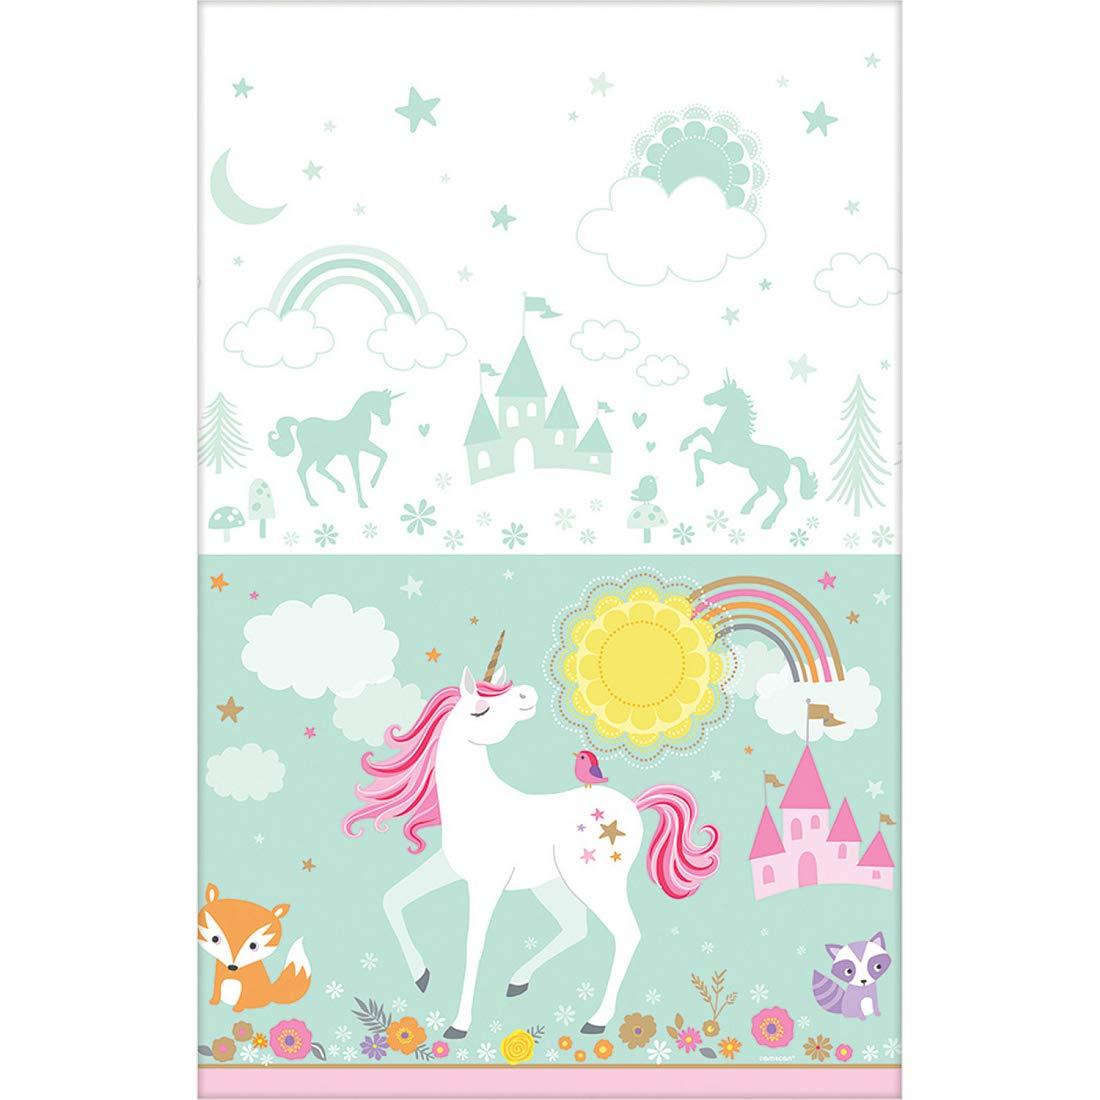 Amakando Encantador Folio para Mesa Lavable Unicornio ...